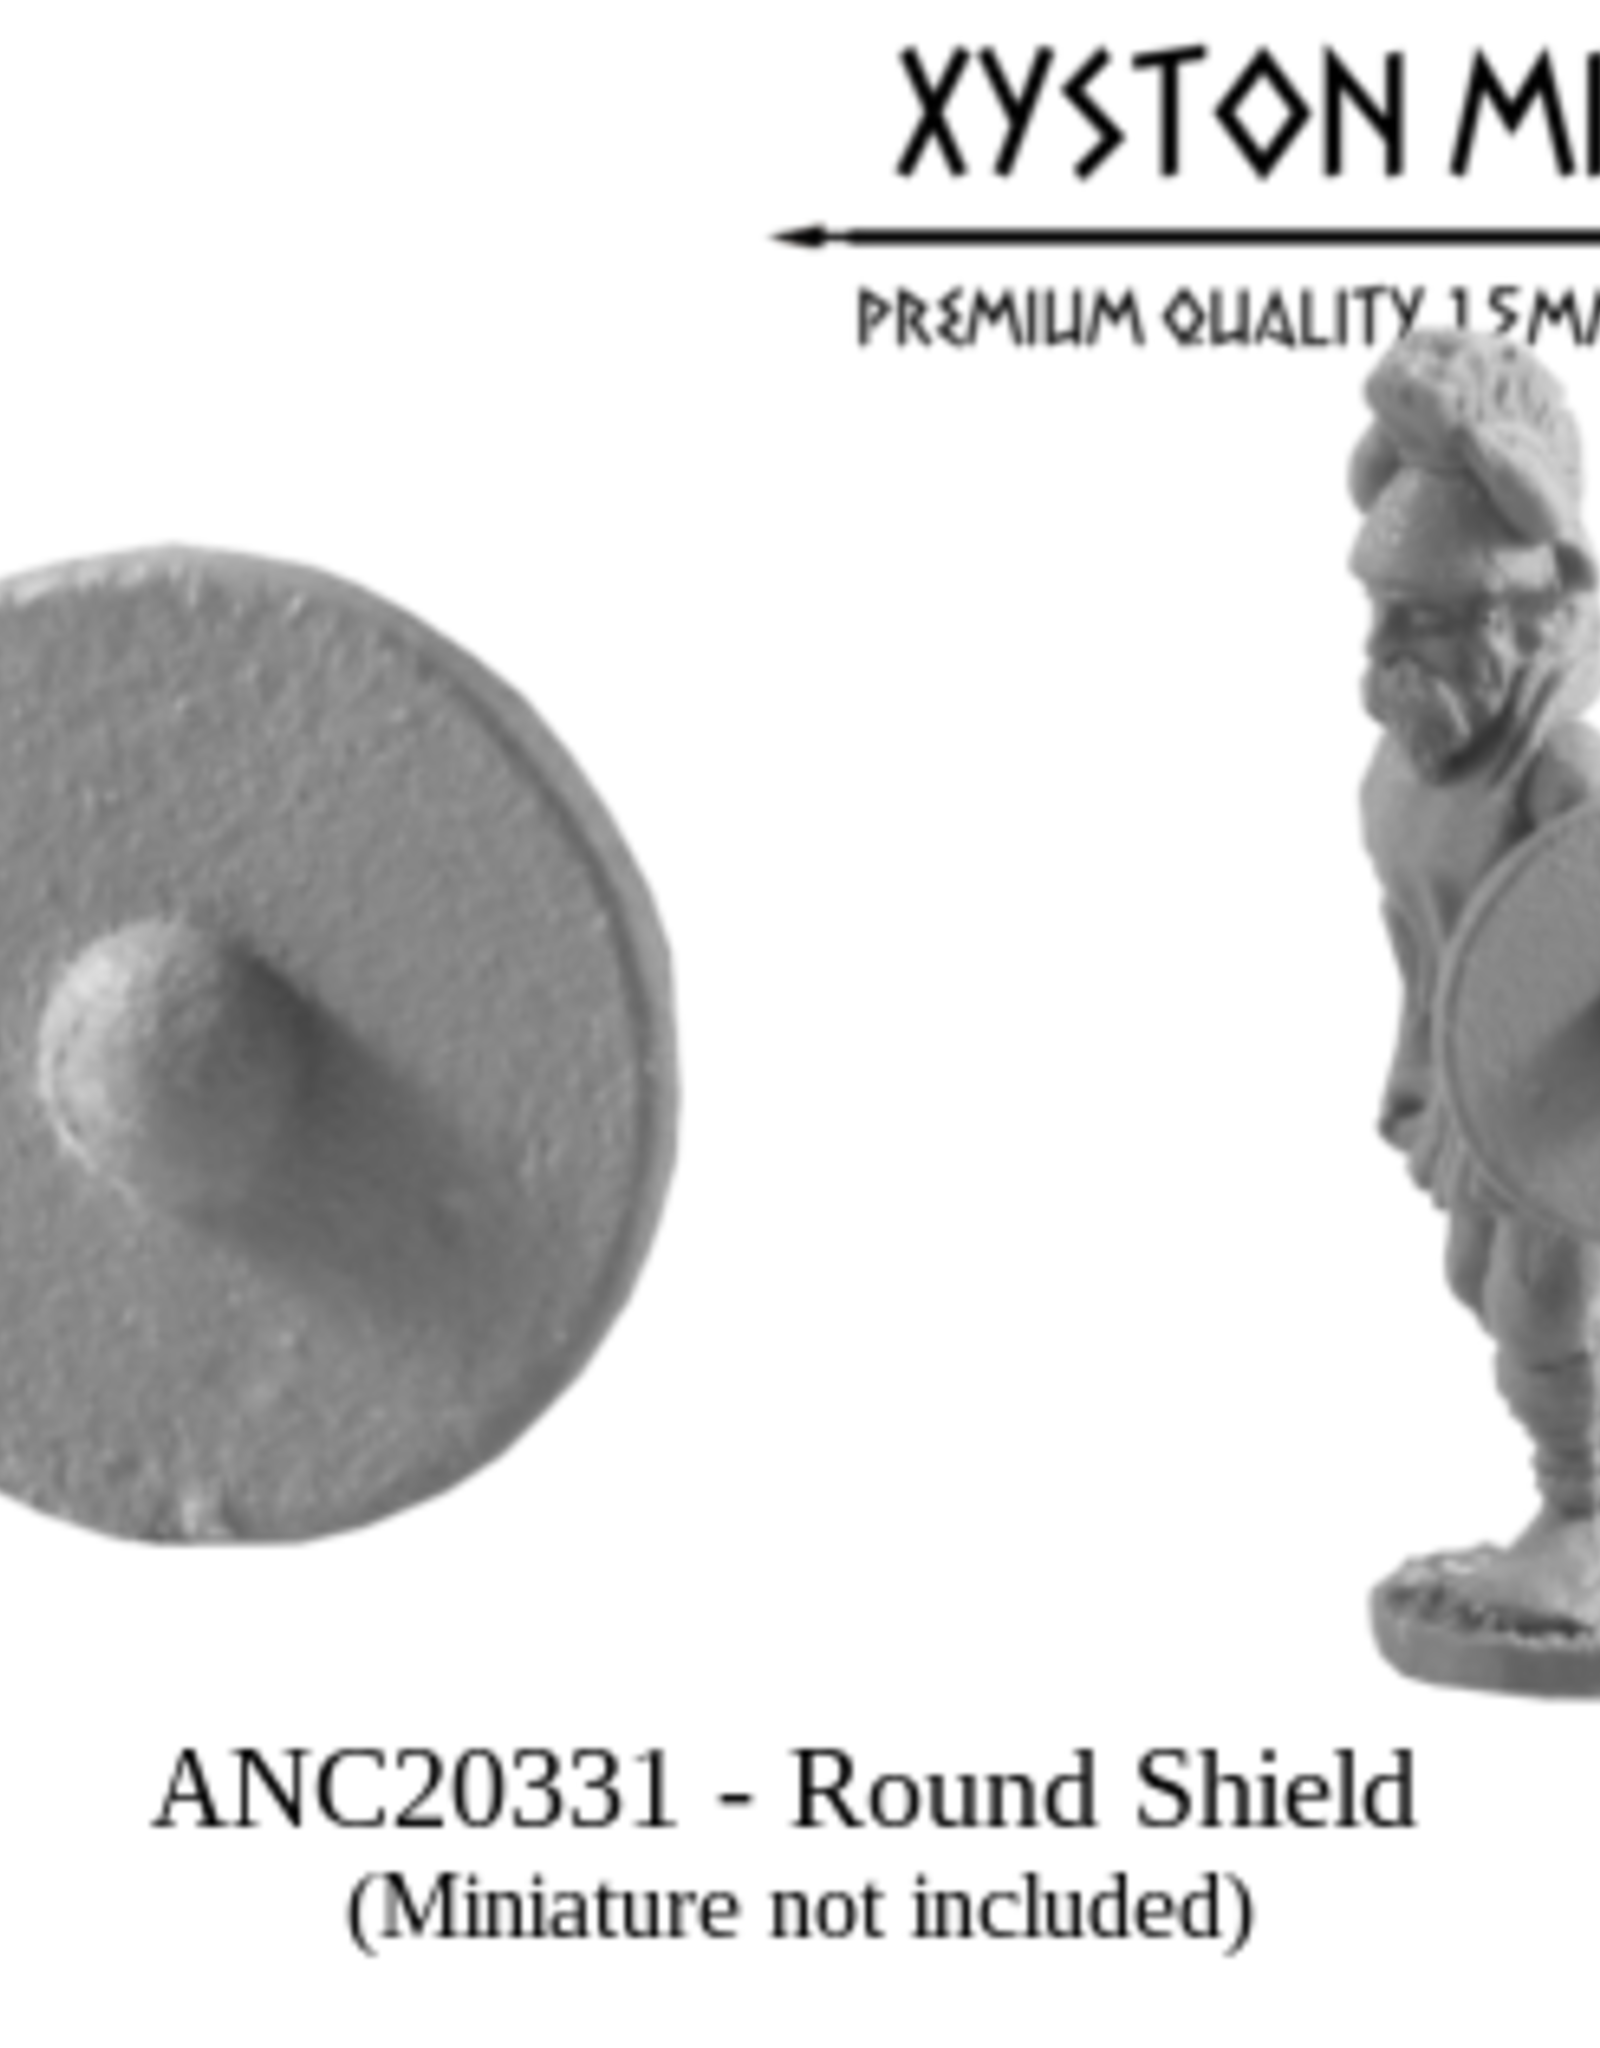 Xyston ANC20331 - Round Shield (24)